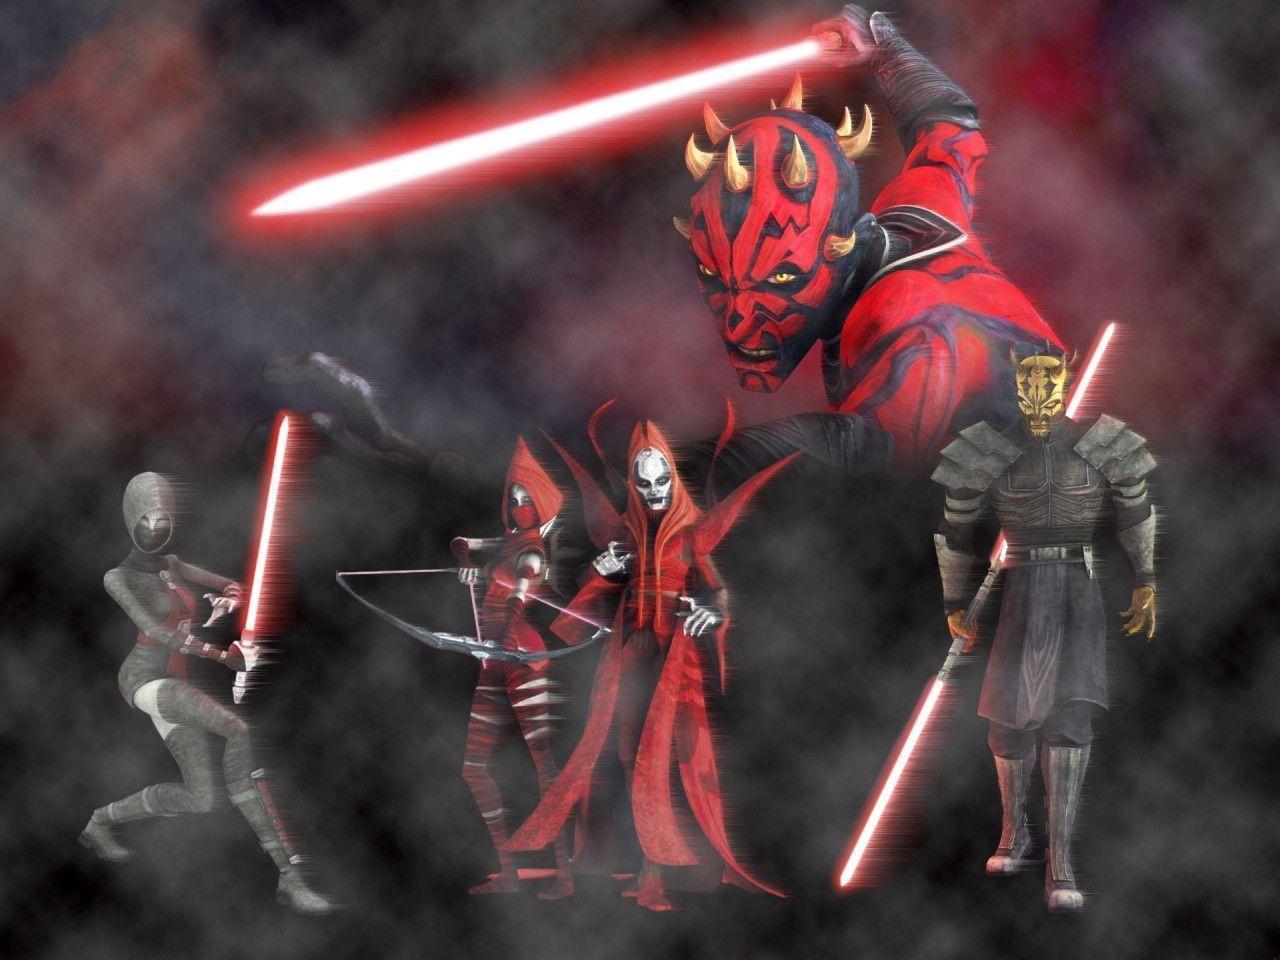 epic star wars trooper wallpaper - photo #14